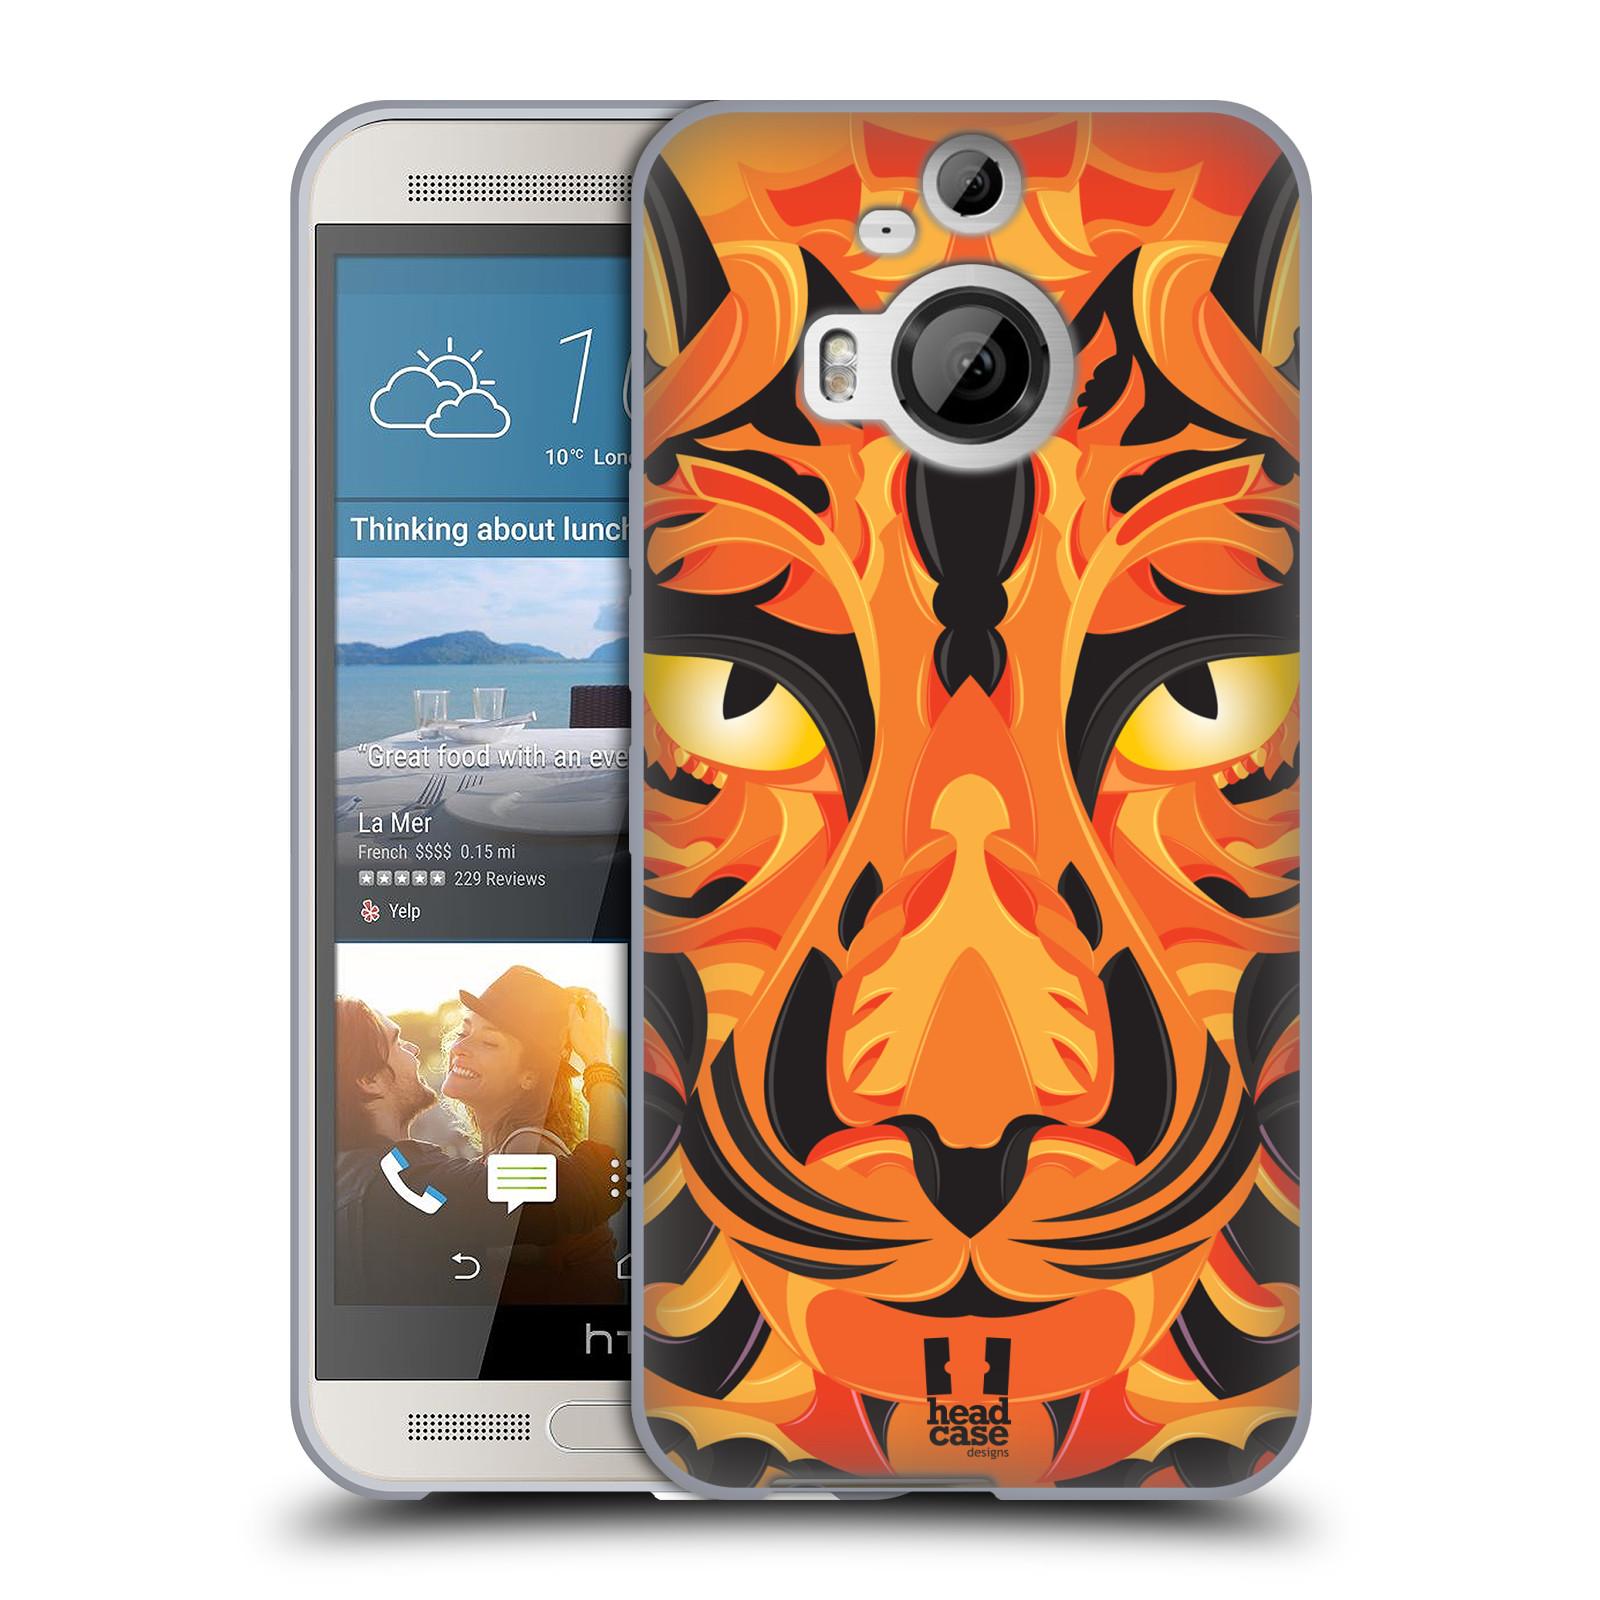 HEAD-CASE-DESIGNS-CYBER-MECHANIMALS-SOFT-GEL-CASE-FOR-HTC-PHONES-2